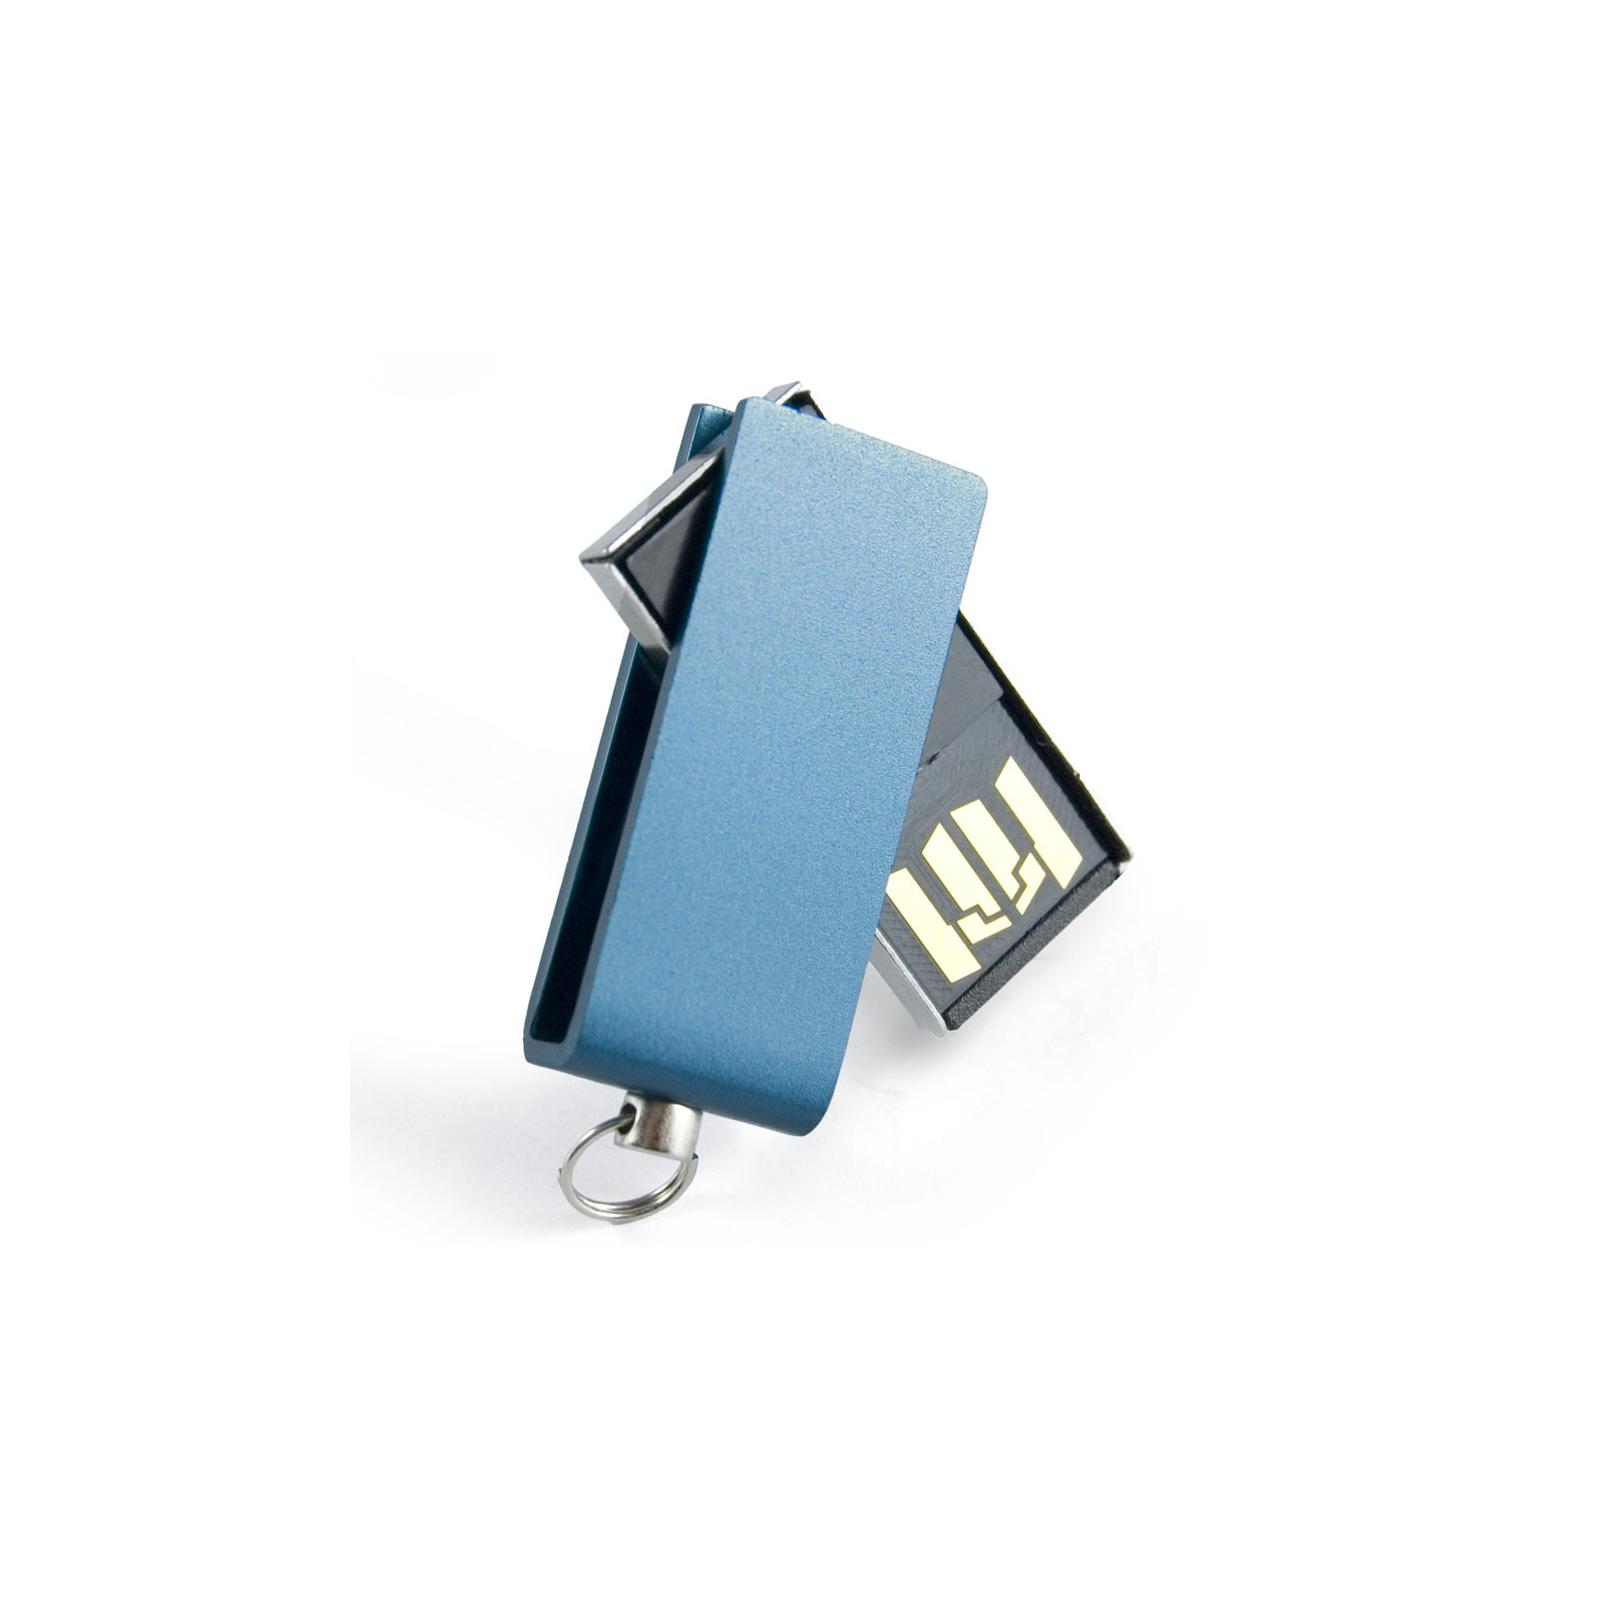 USB флеш накопитель Goodram 64GB UCU2 Cube Black USB 2.0 (UCU2-0640K0R11) изображение 2